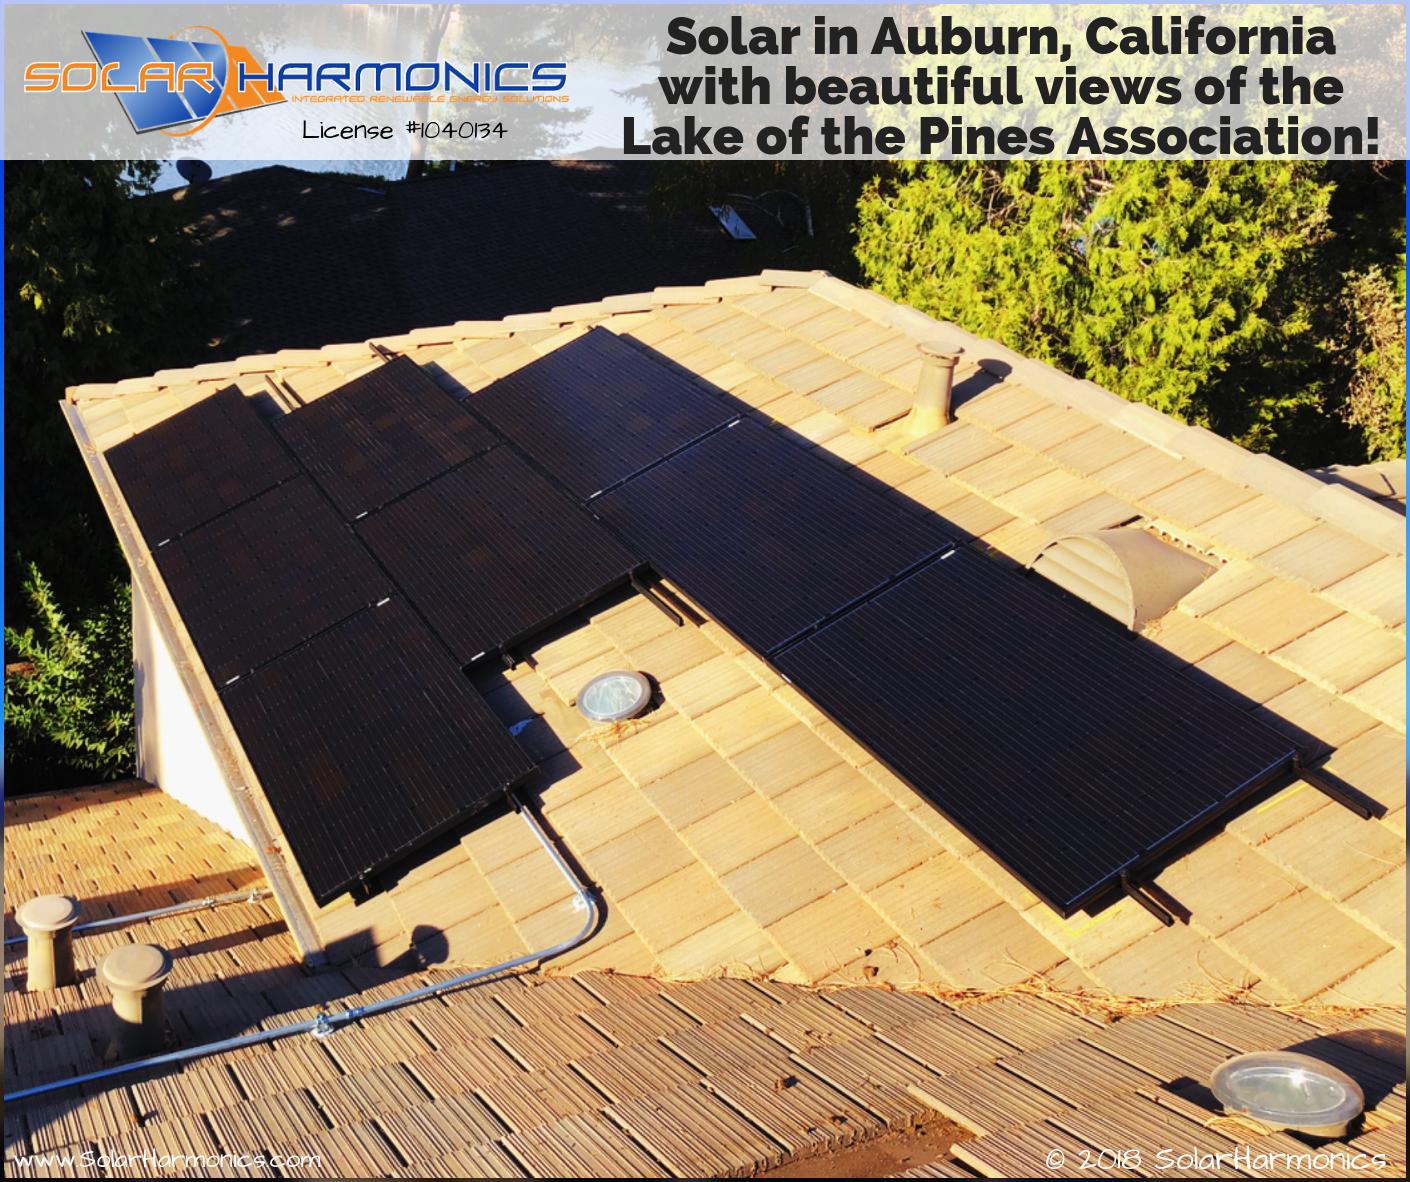 Solar In Auburn California With Beautiful Views Of Lakeofthepinesassociation Solaredge Technologies Lake Of The Pines Solar Installation Beautiful Views